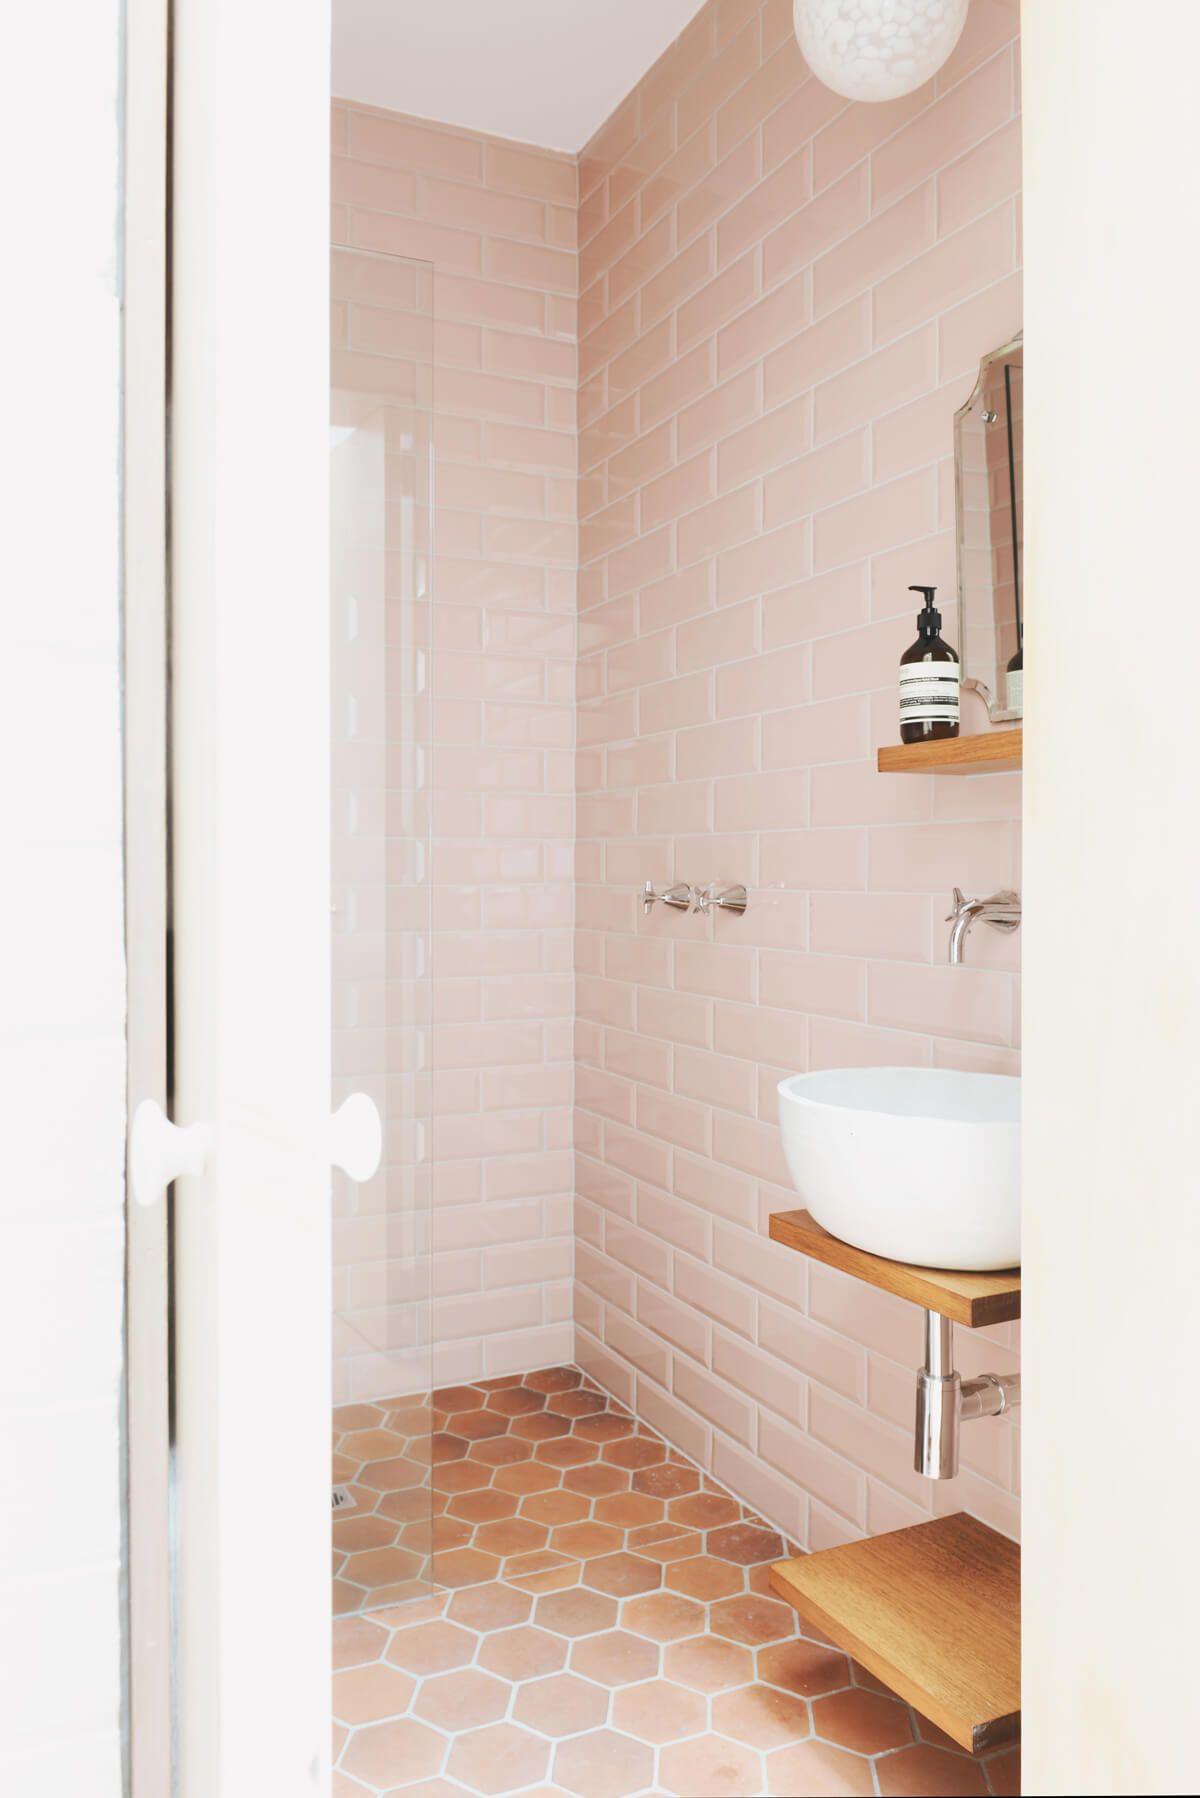 Pink Tiled Bath Remodelista 2 Salle De Bain Rose Salle De Bain Design Interieur Salle De Bain